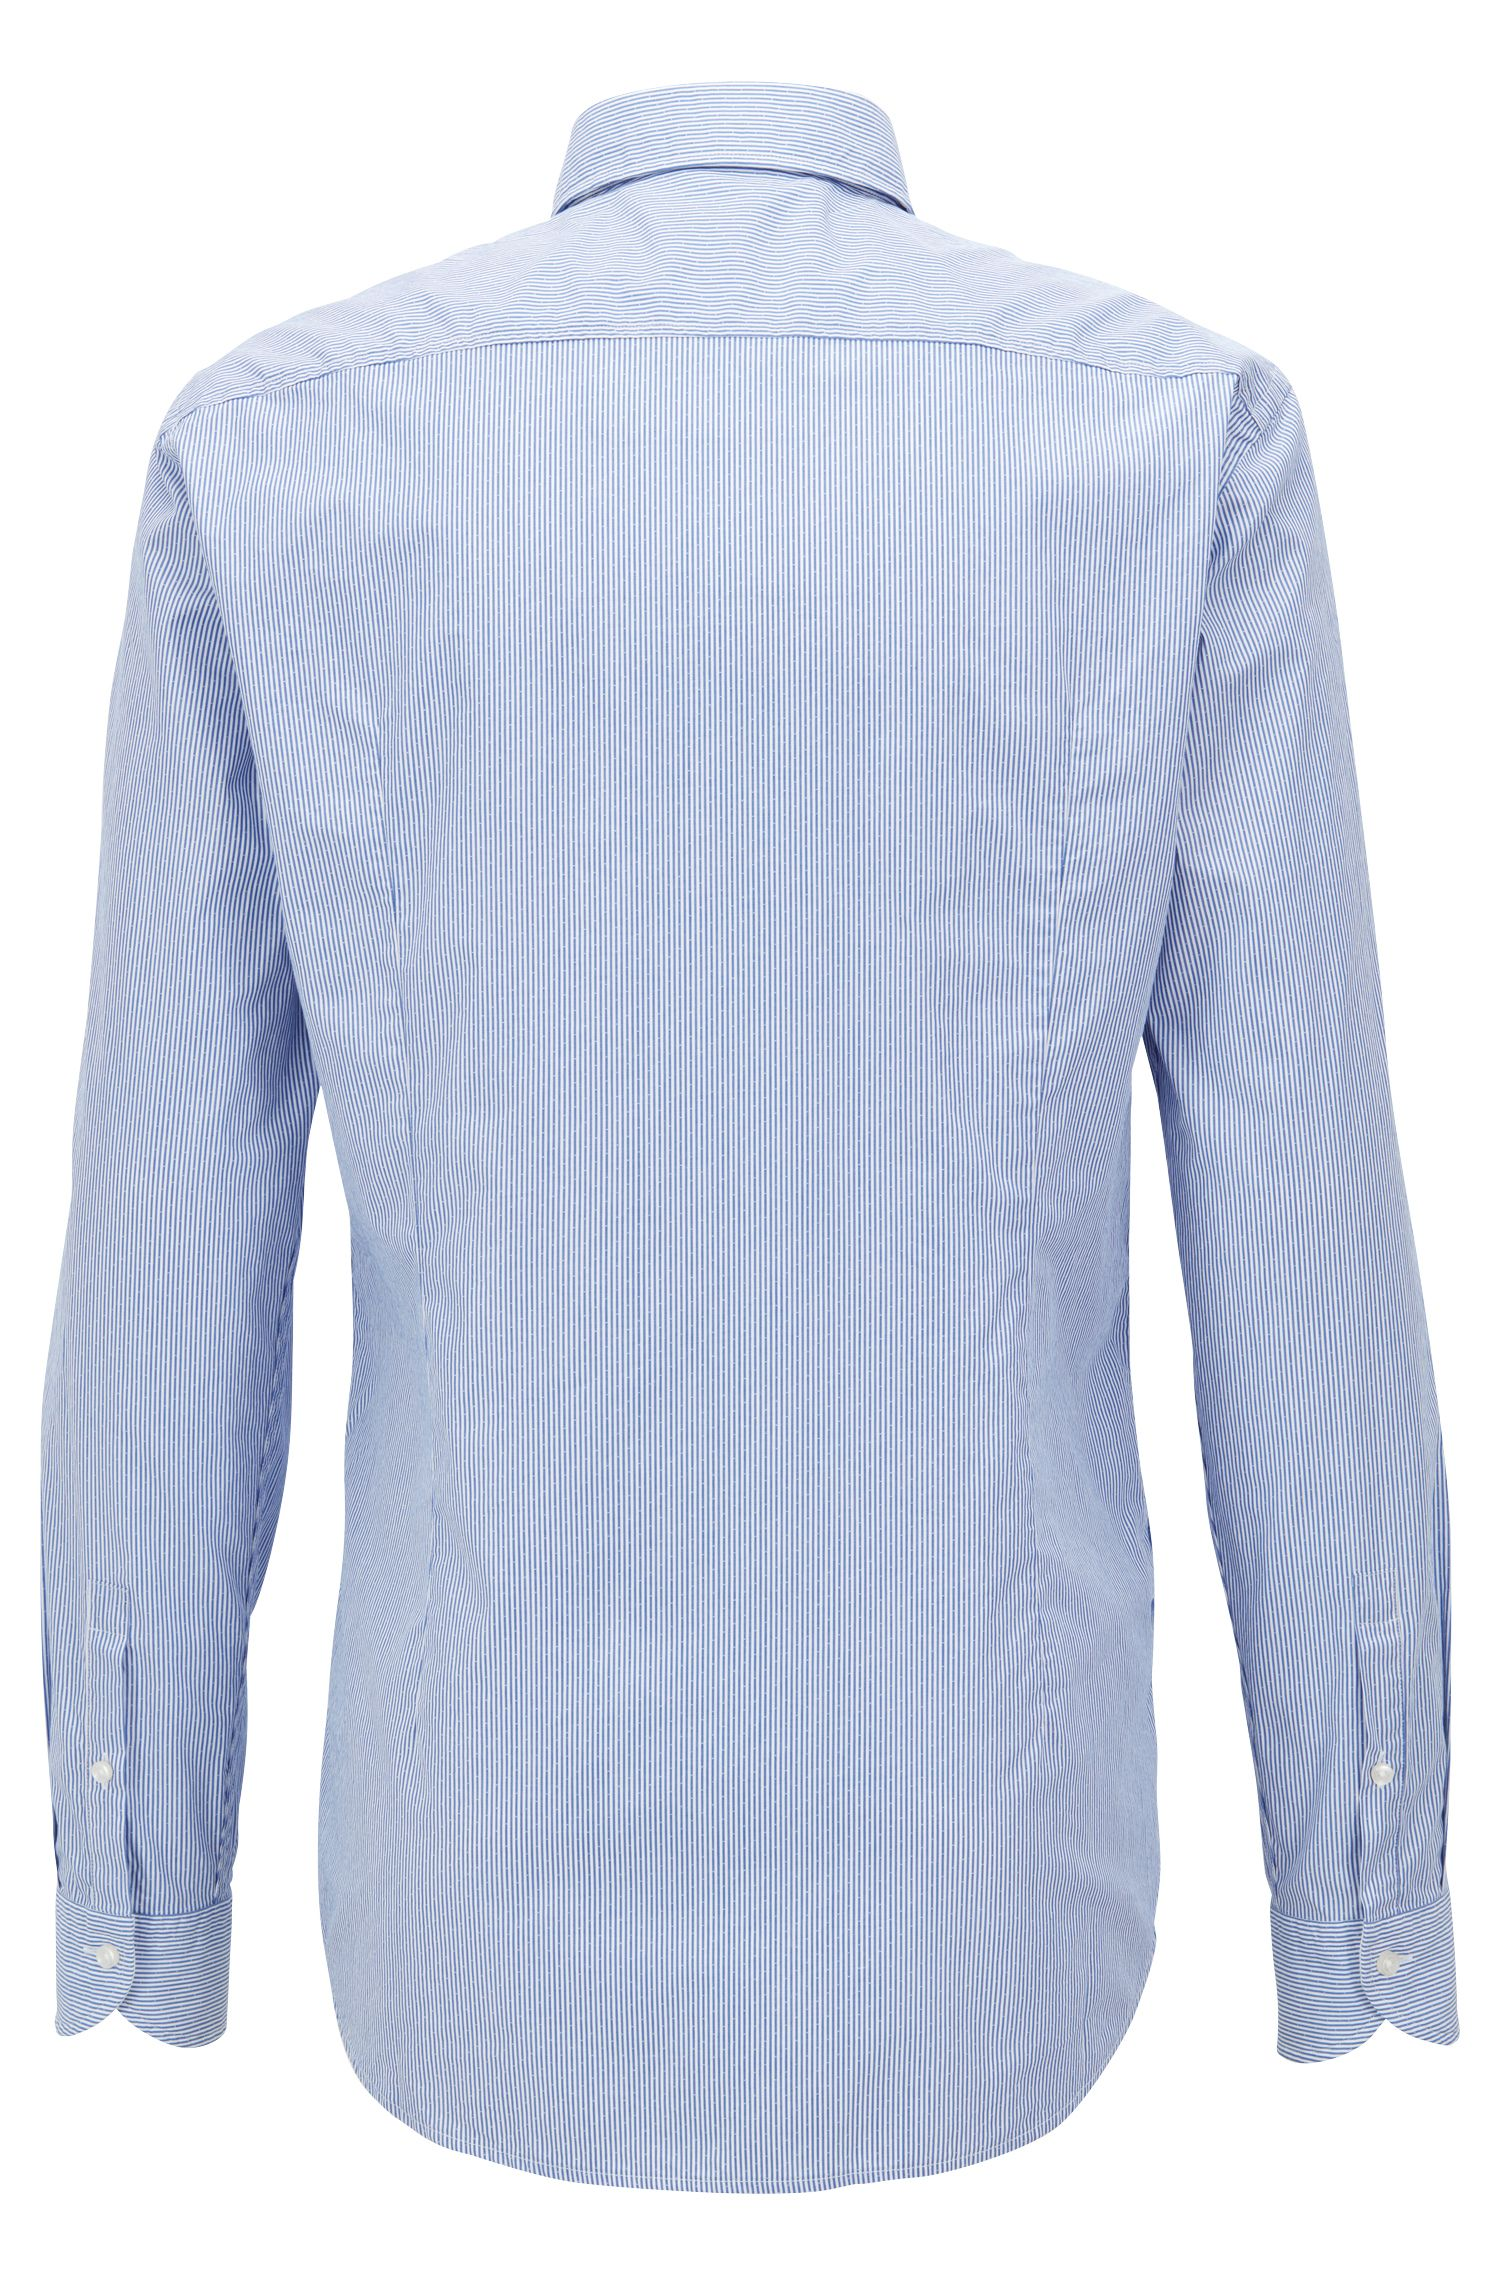 Slim-fit shirt in striped dobby cotton poplin, Blue